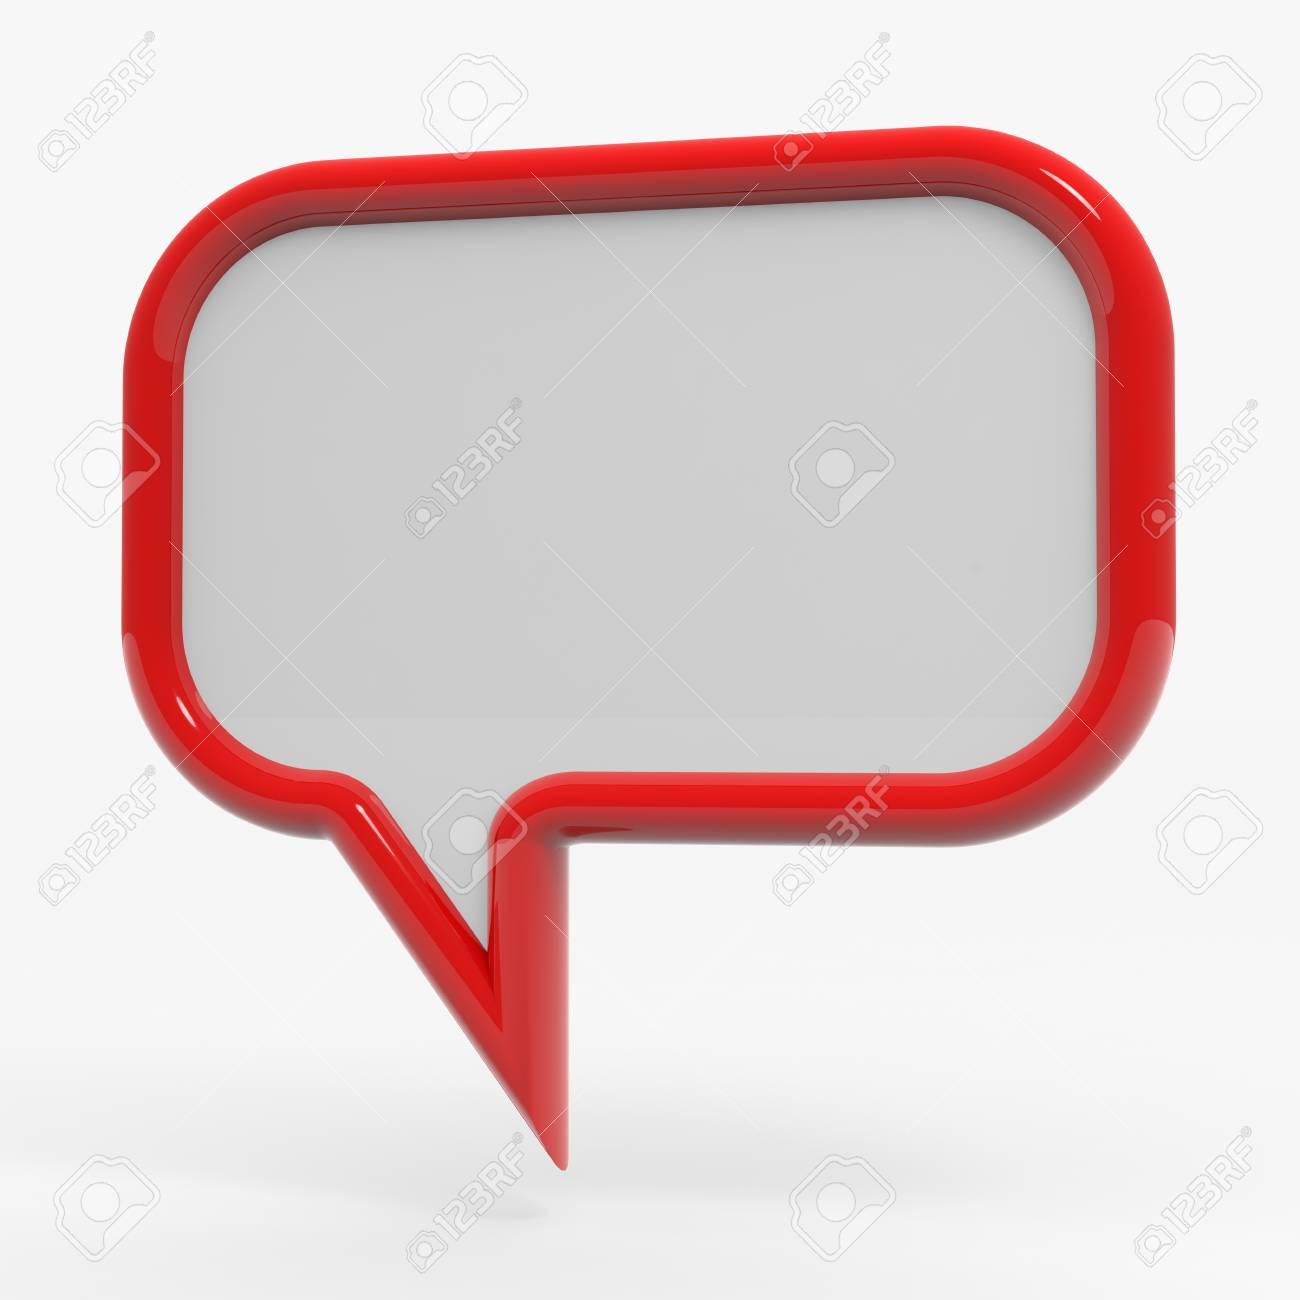 Bubble talk. Computer generated image. Stock Photo - 10504543